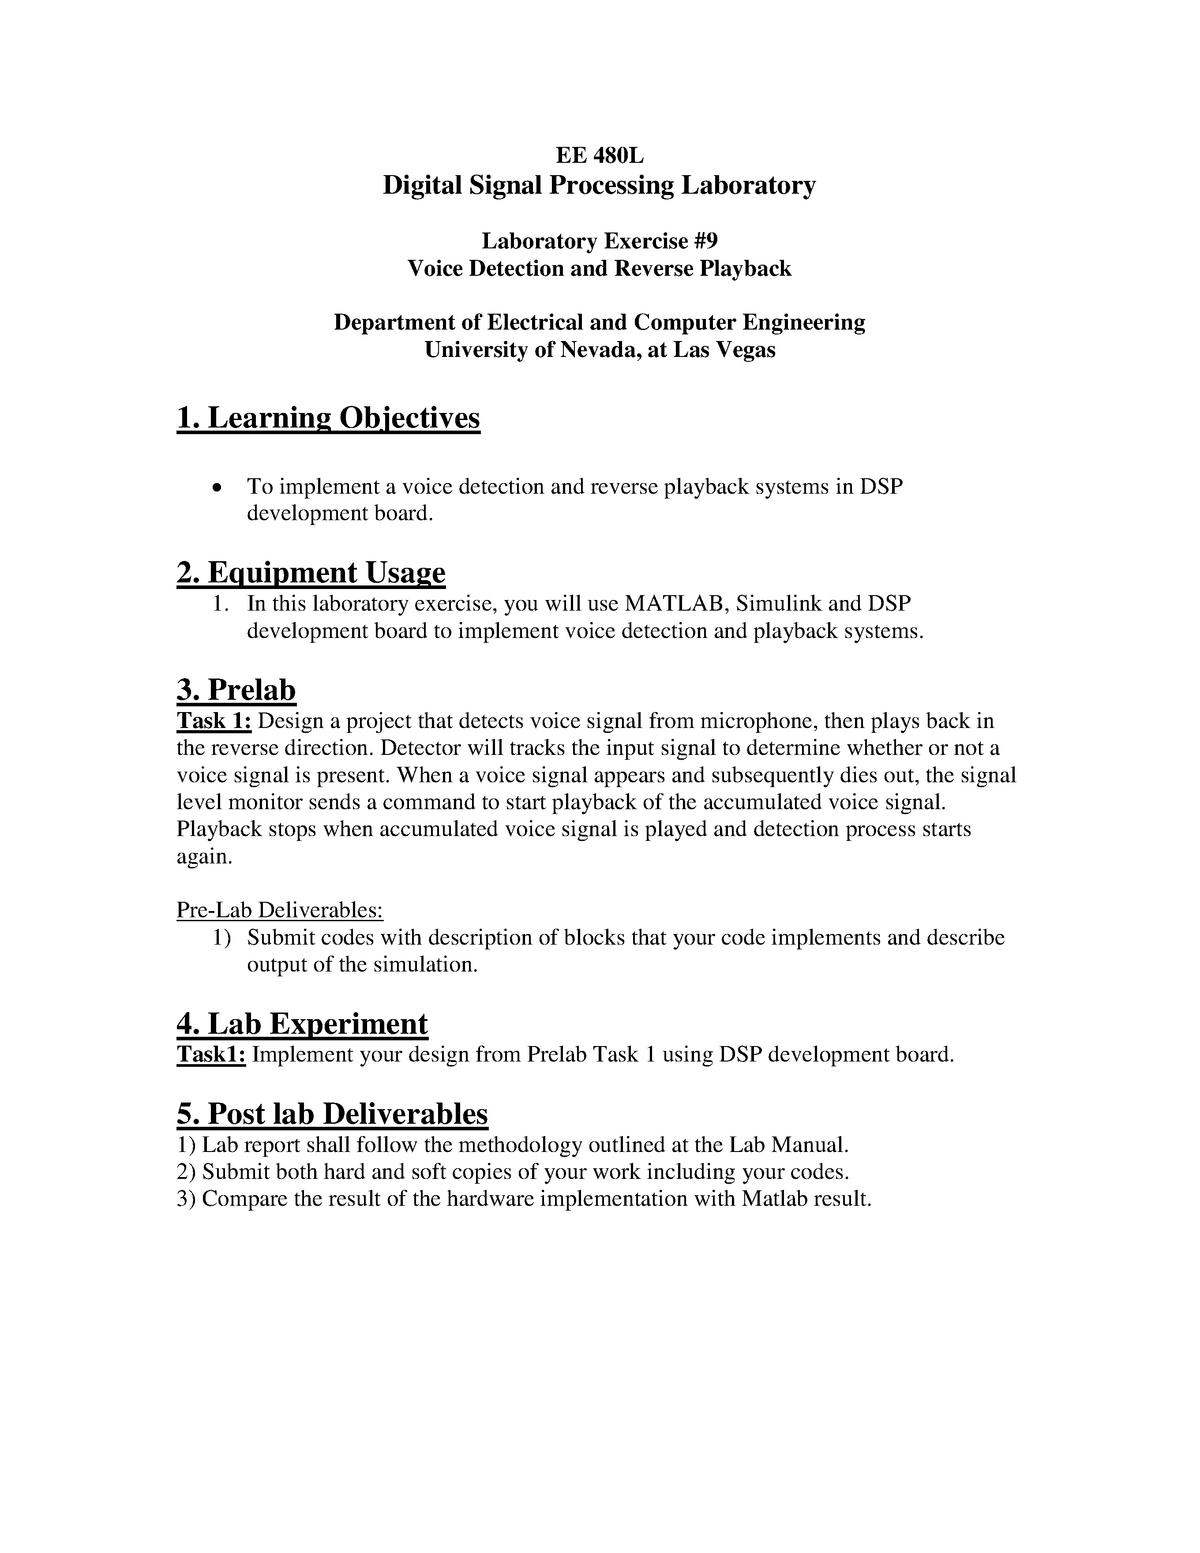 Tutorial work - 10 - EE 480L: Digital Signal Processing Laboratory